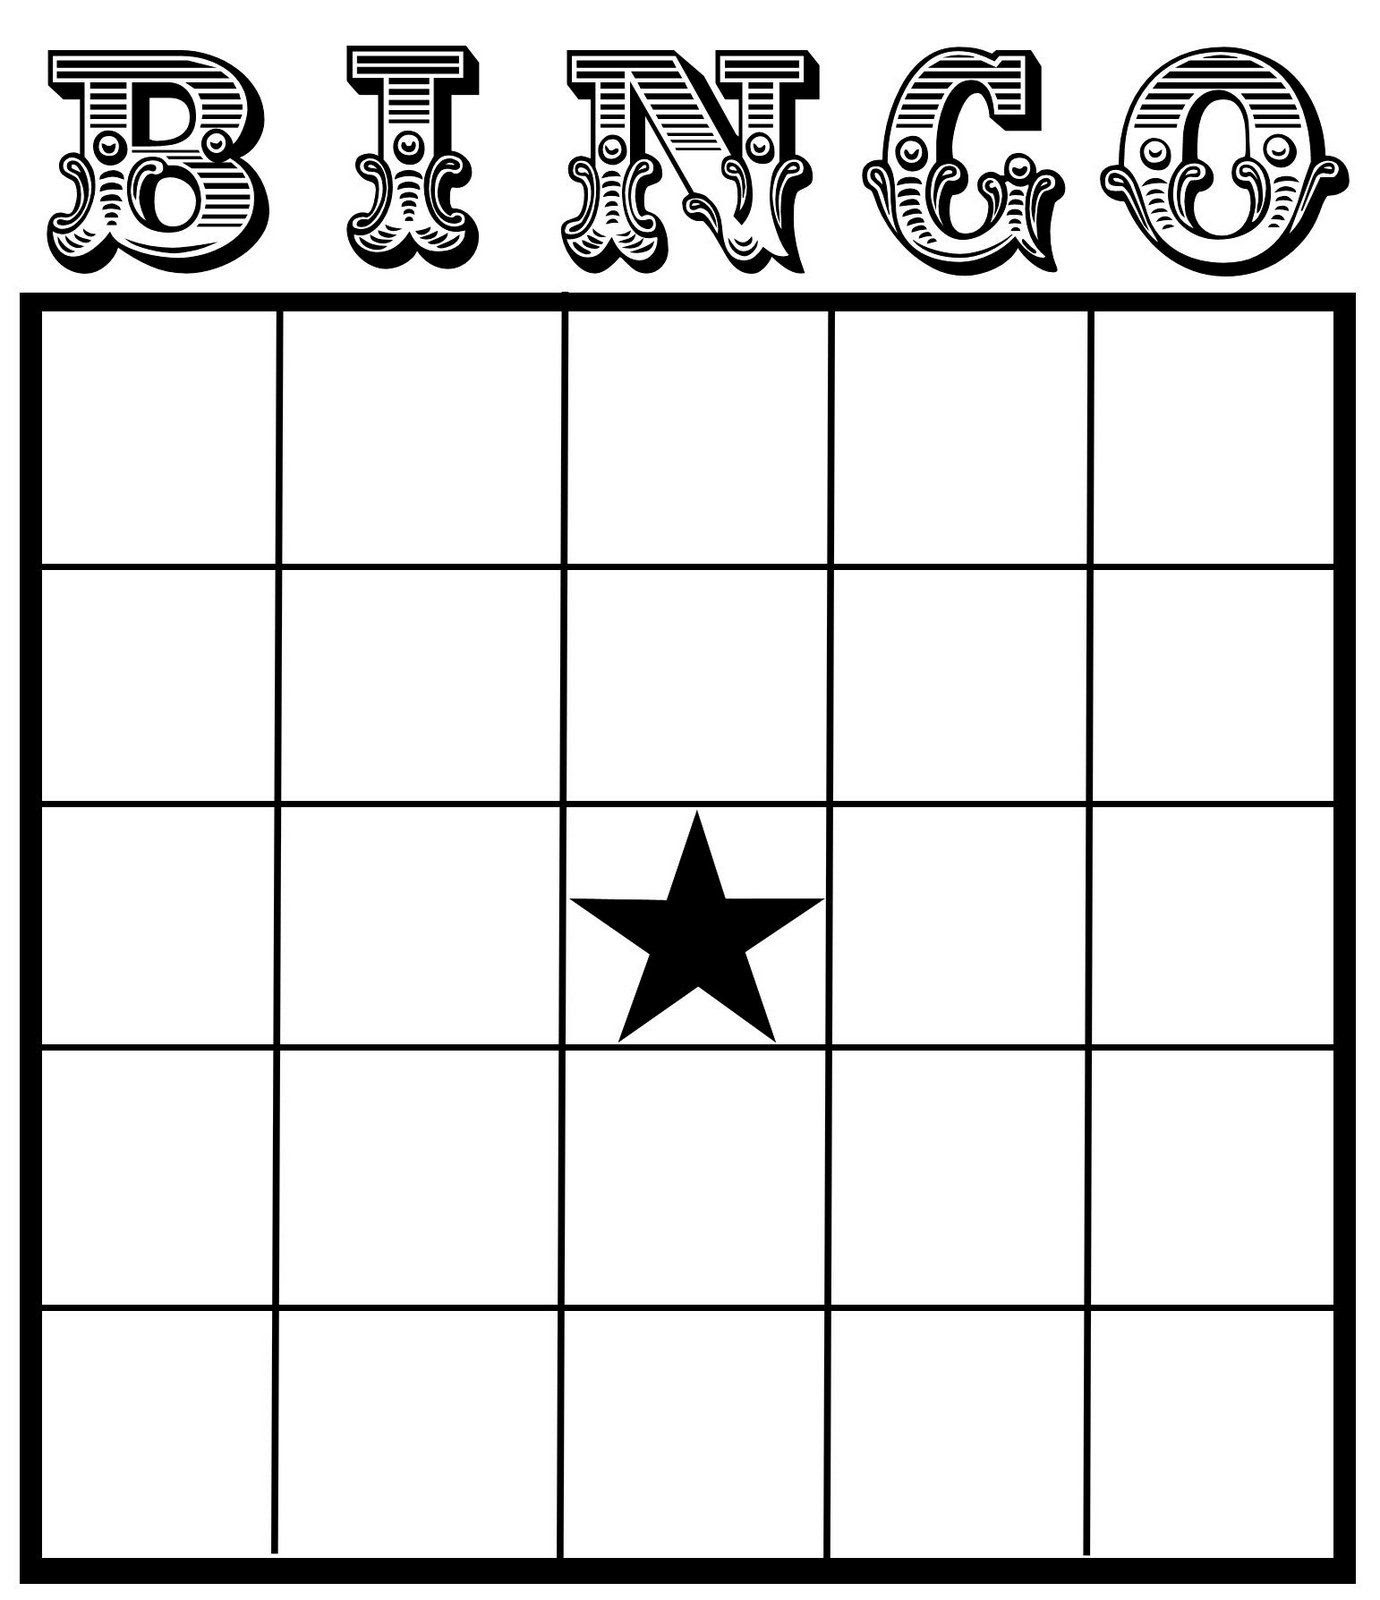 1000+ ideas about Bingo Template on Pinterest | Bingo, Blank bingo ...